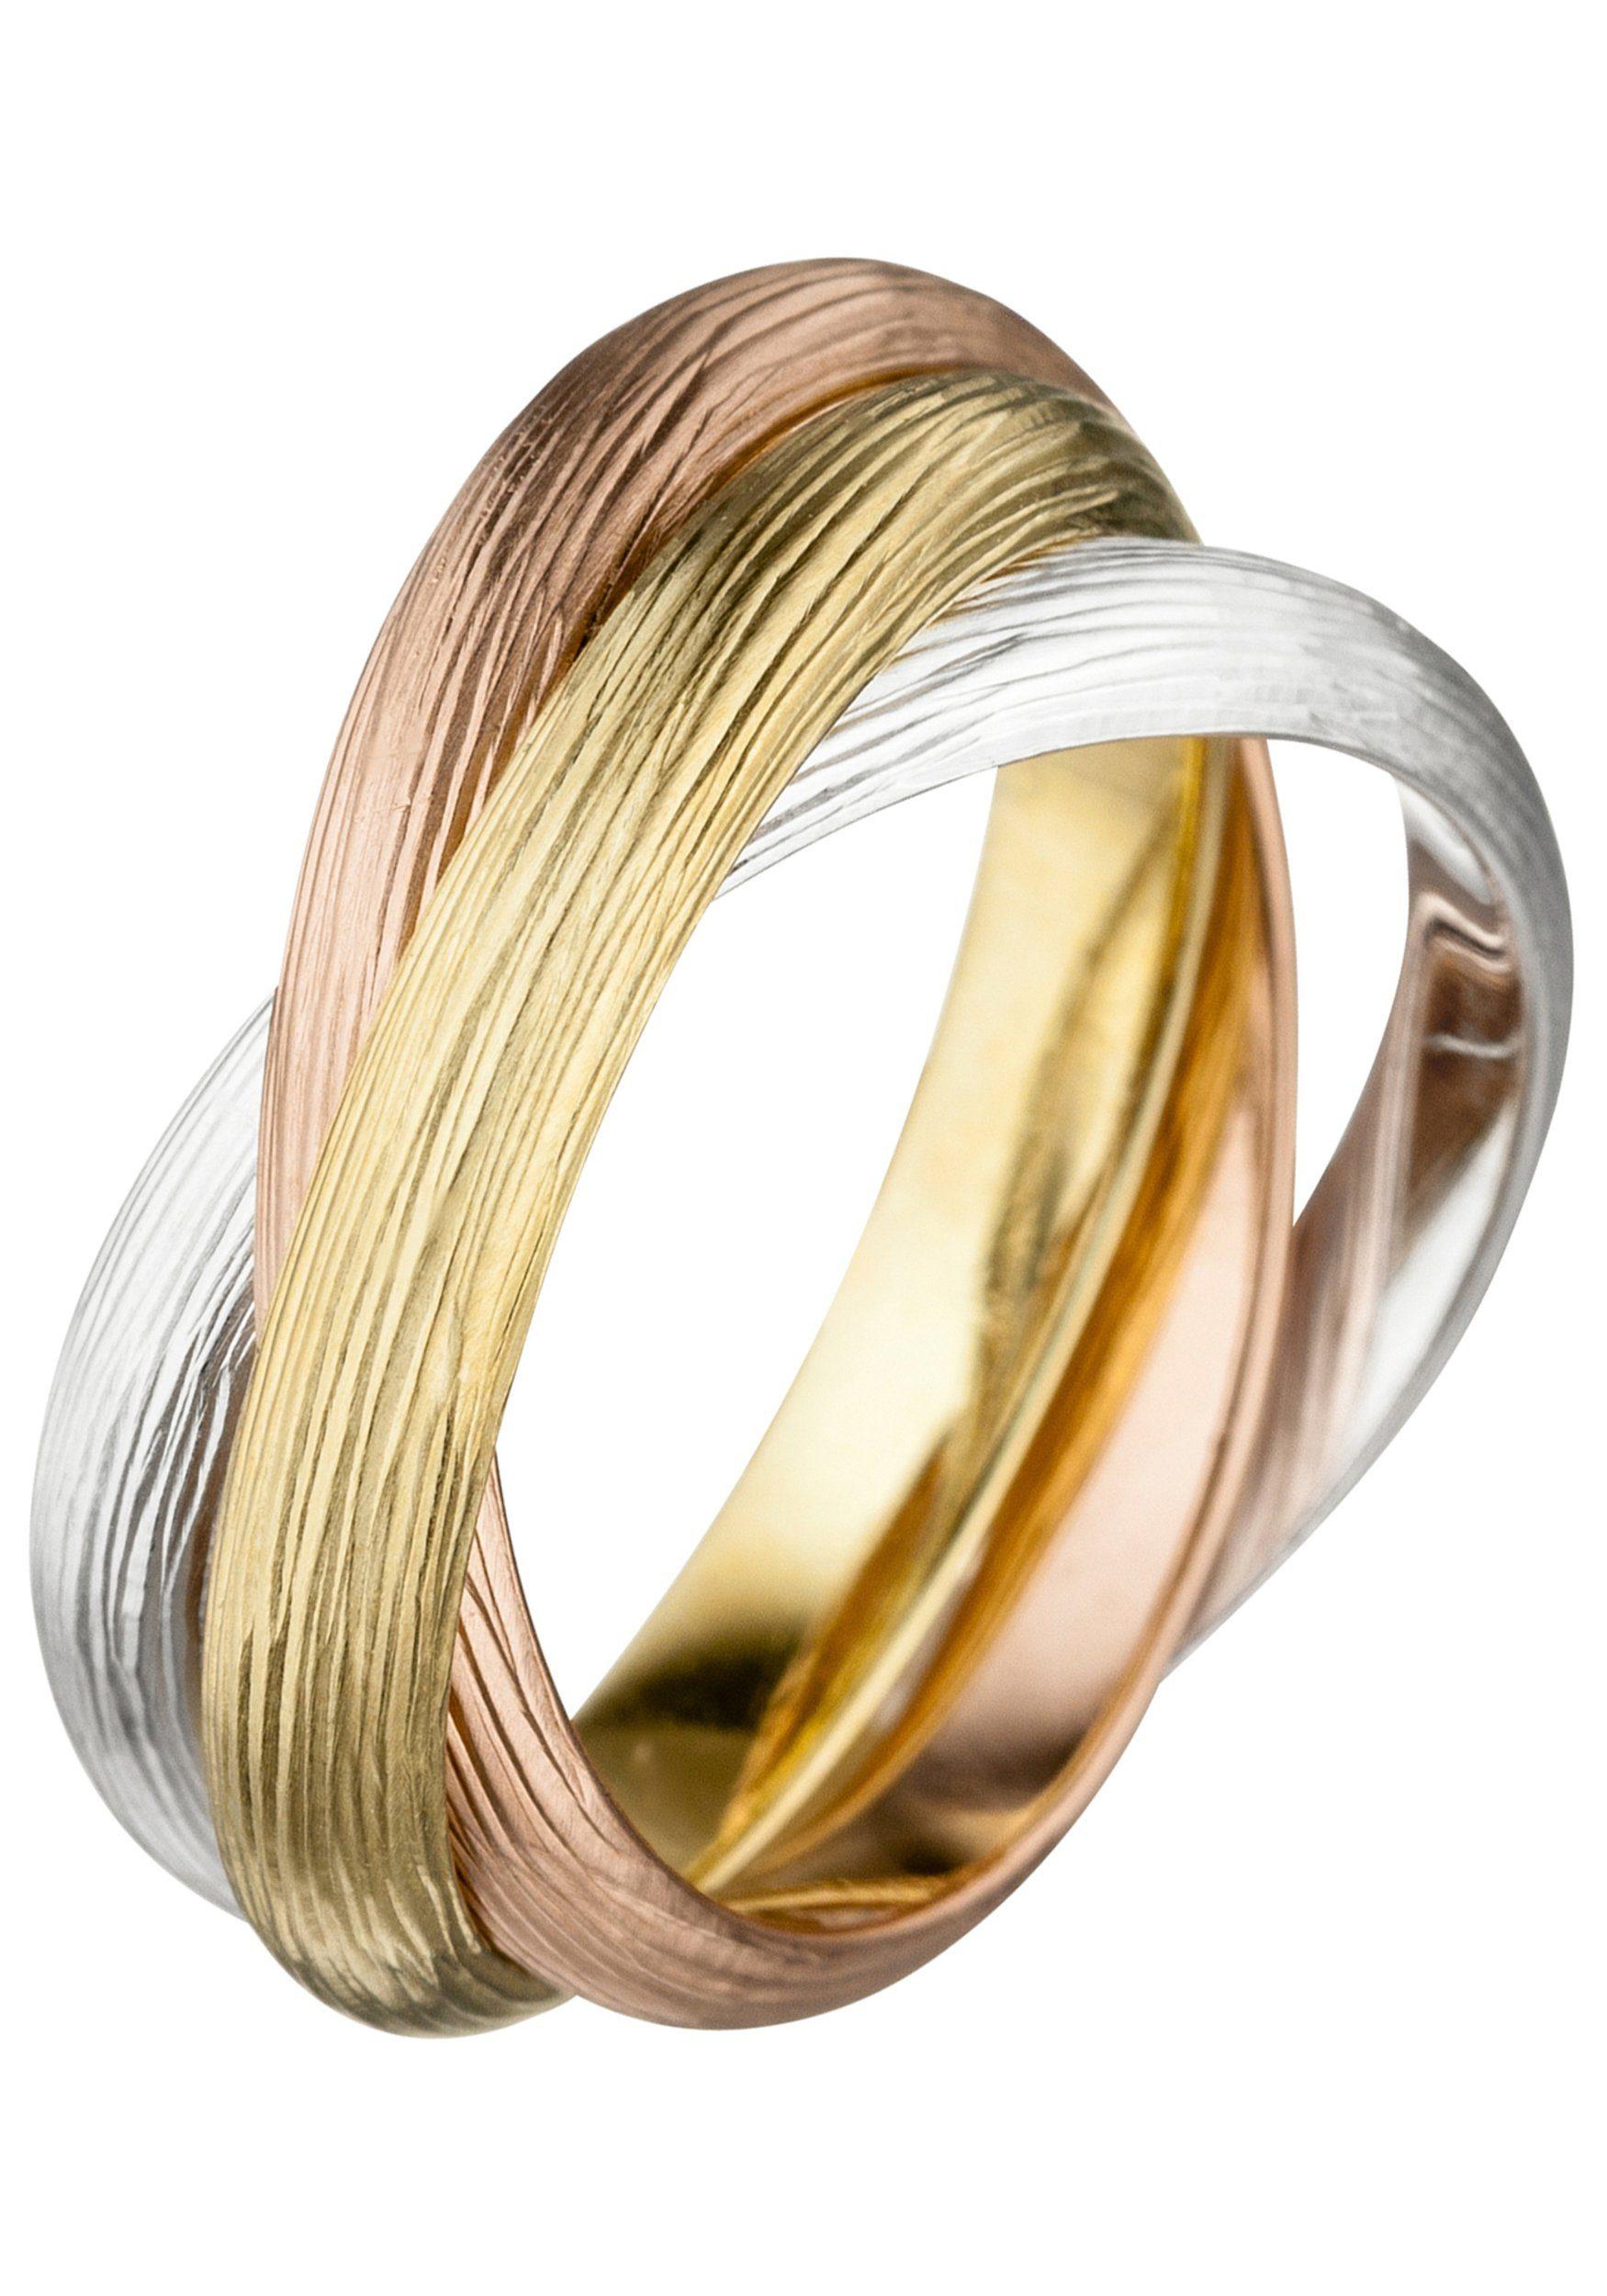 JOBO Fingerring verschlungen 925 Silber tricolor vergoldet